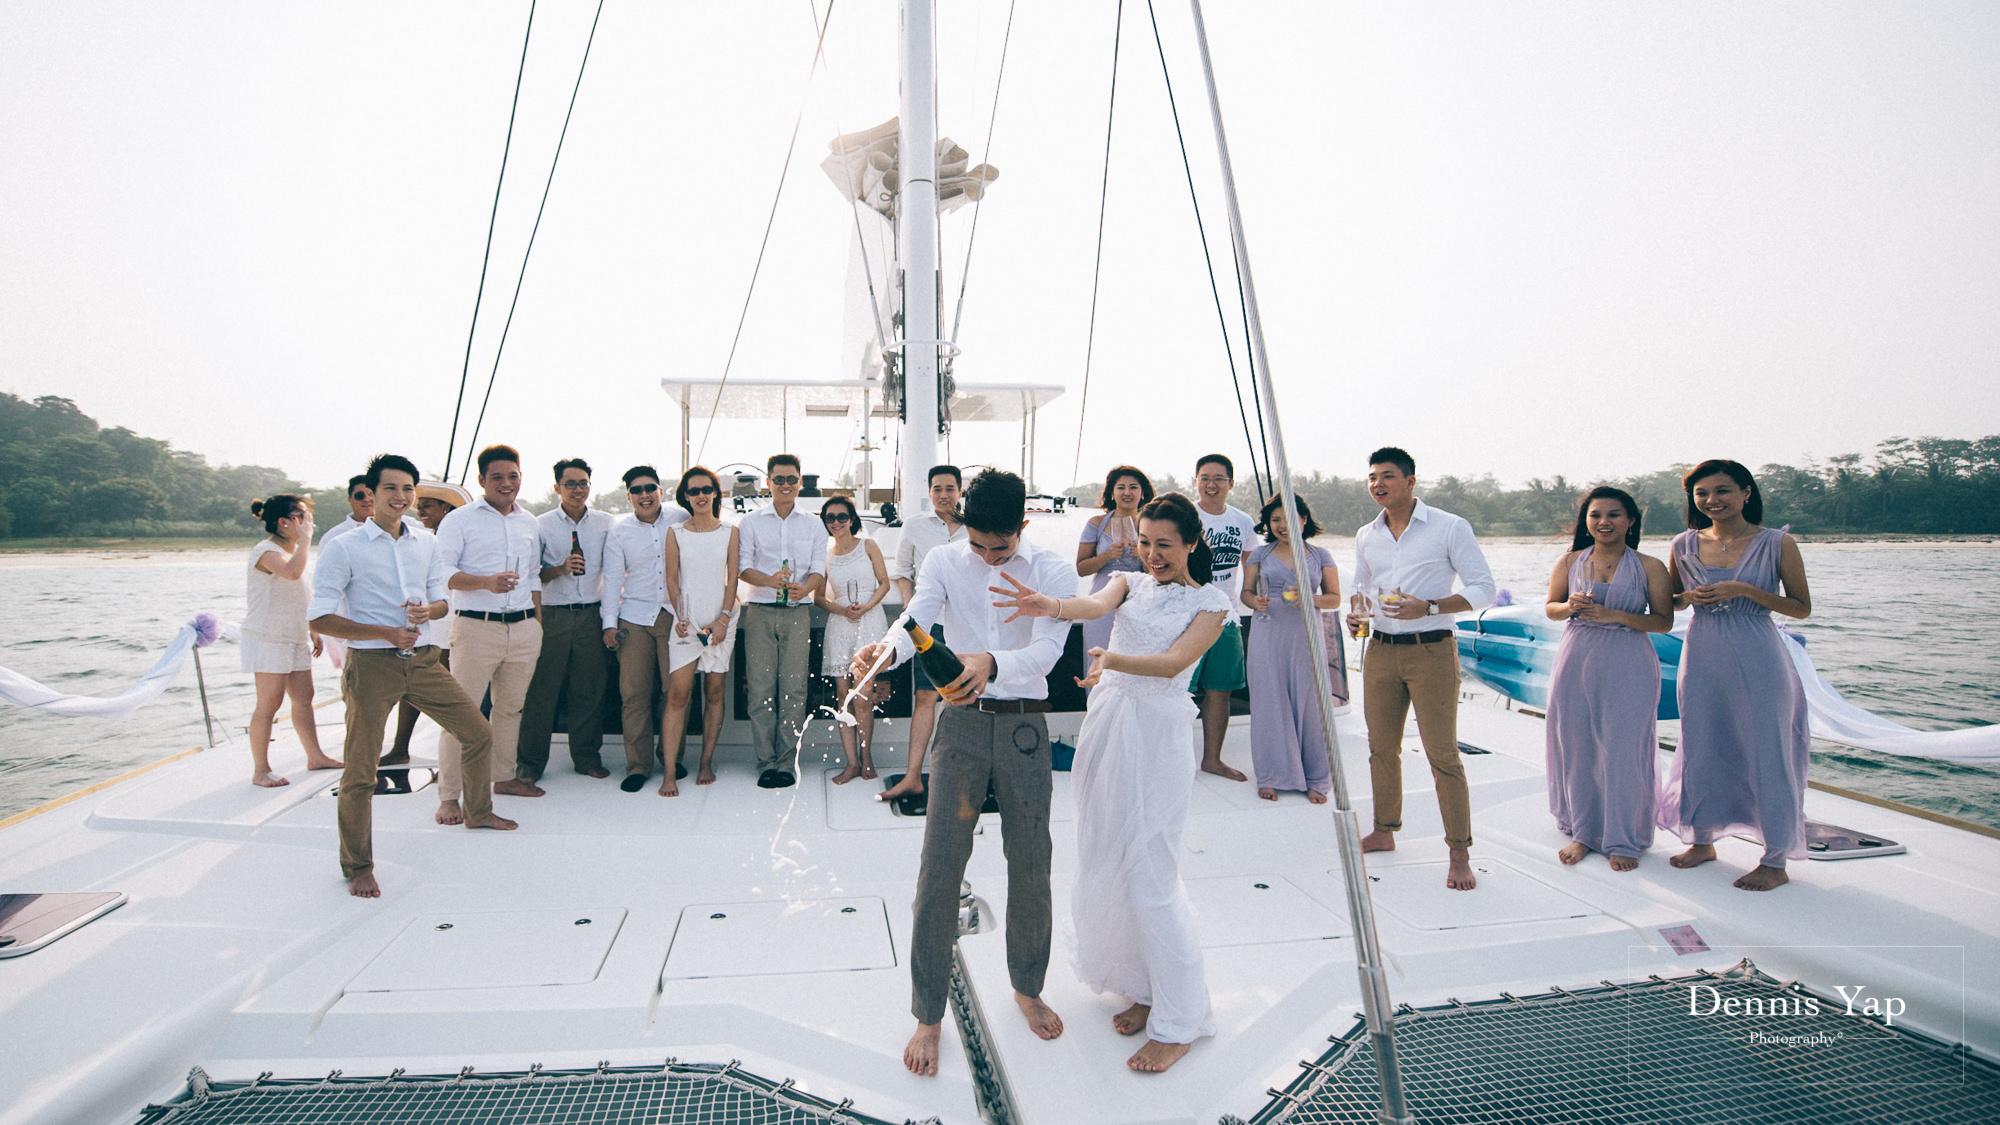 danny sherine wedding reception registration of marriage yacht fun beloved sea dennis yap photography malaysia top wedding photographer-32.jpg